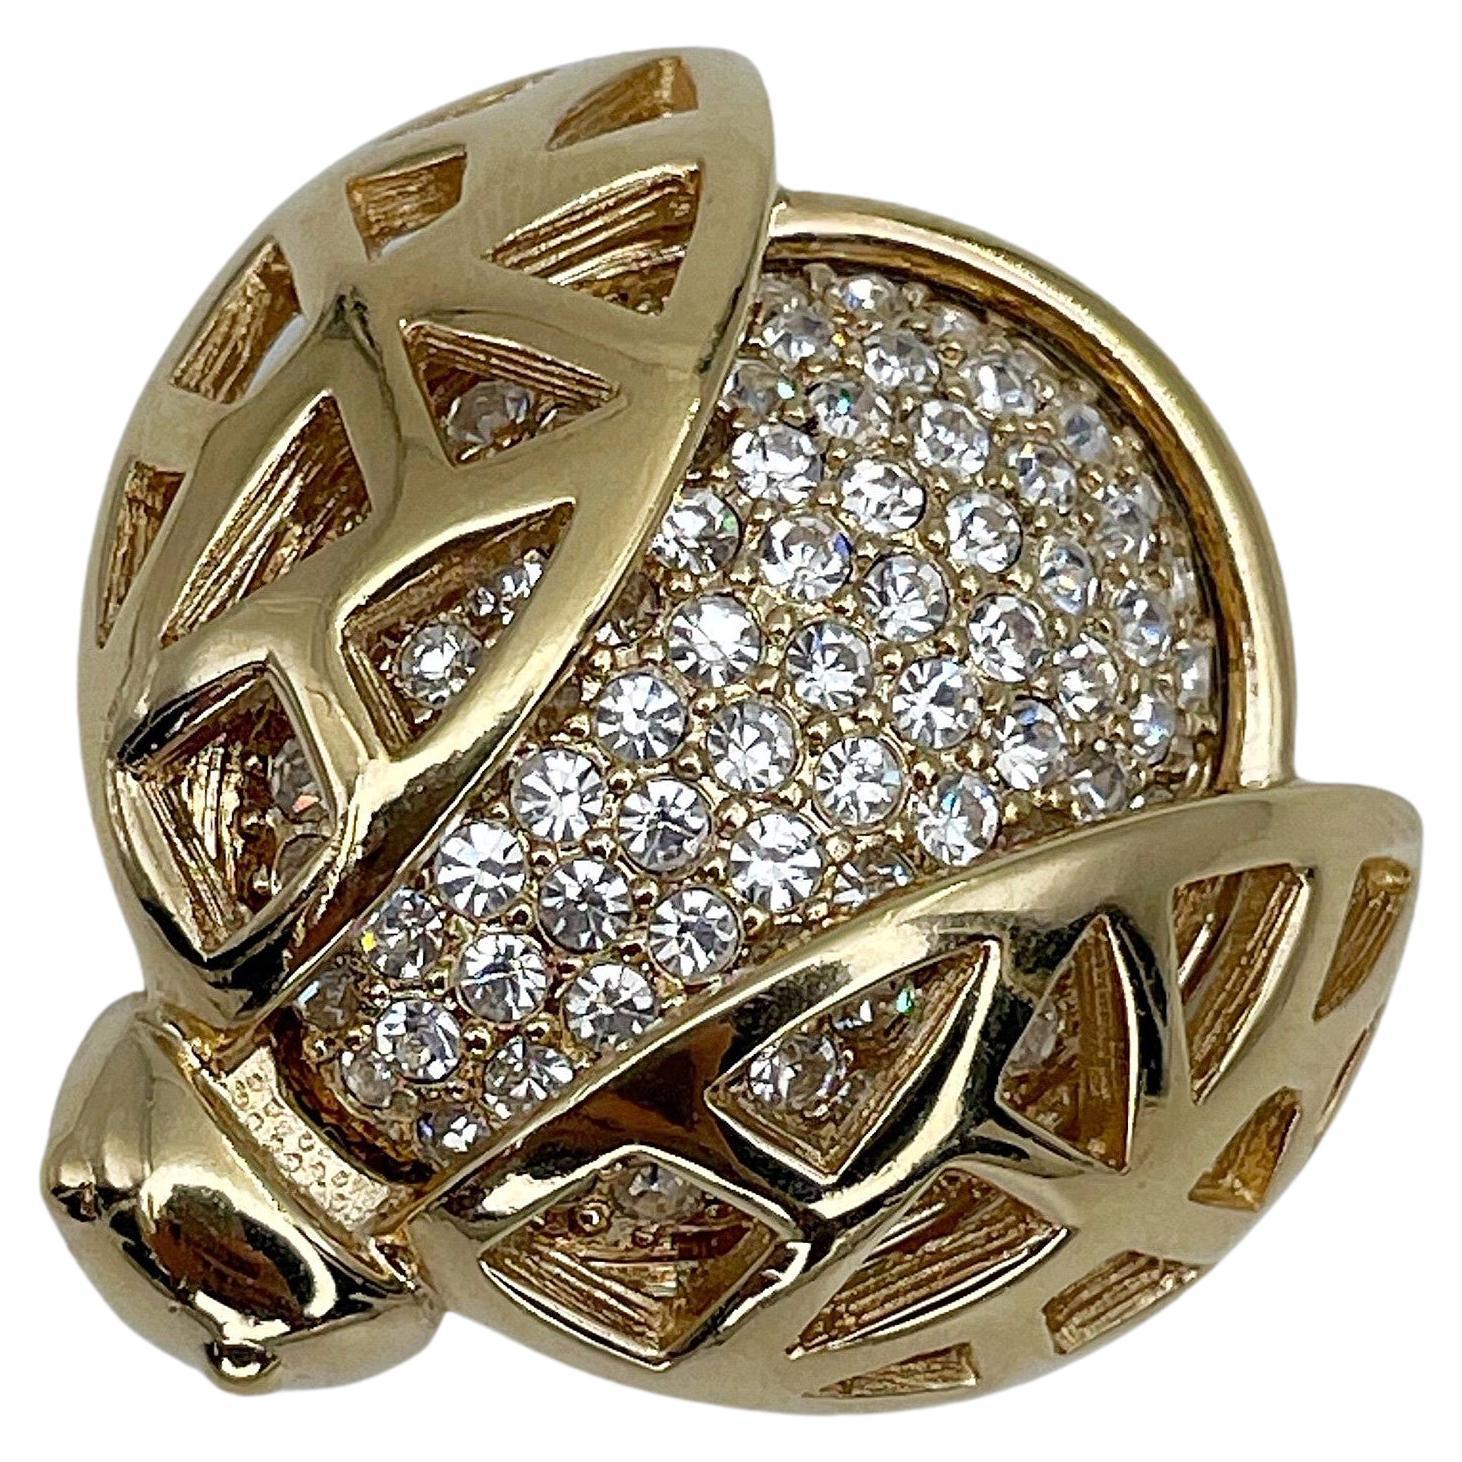 Vintage Christian Dior Gold Tone Ladybug Rhinestone Pin Brooch